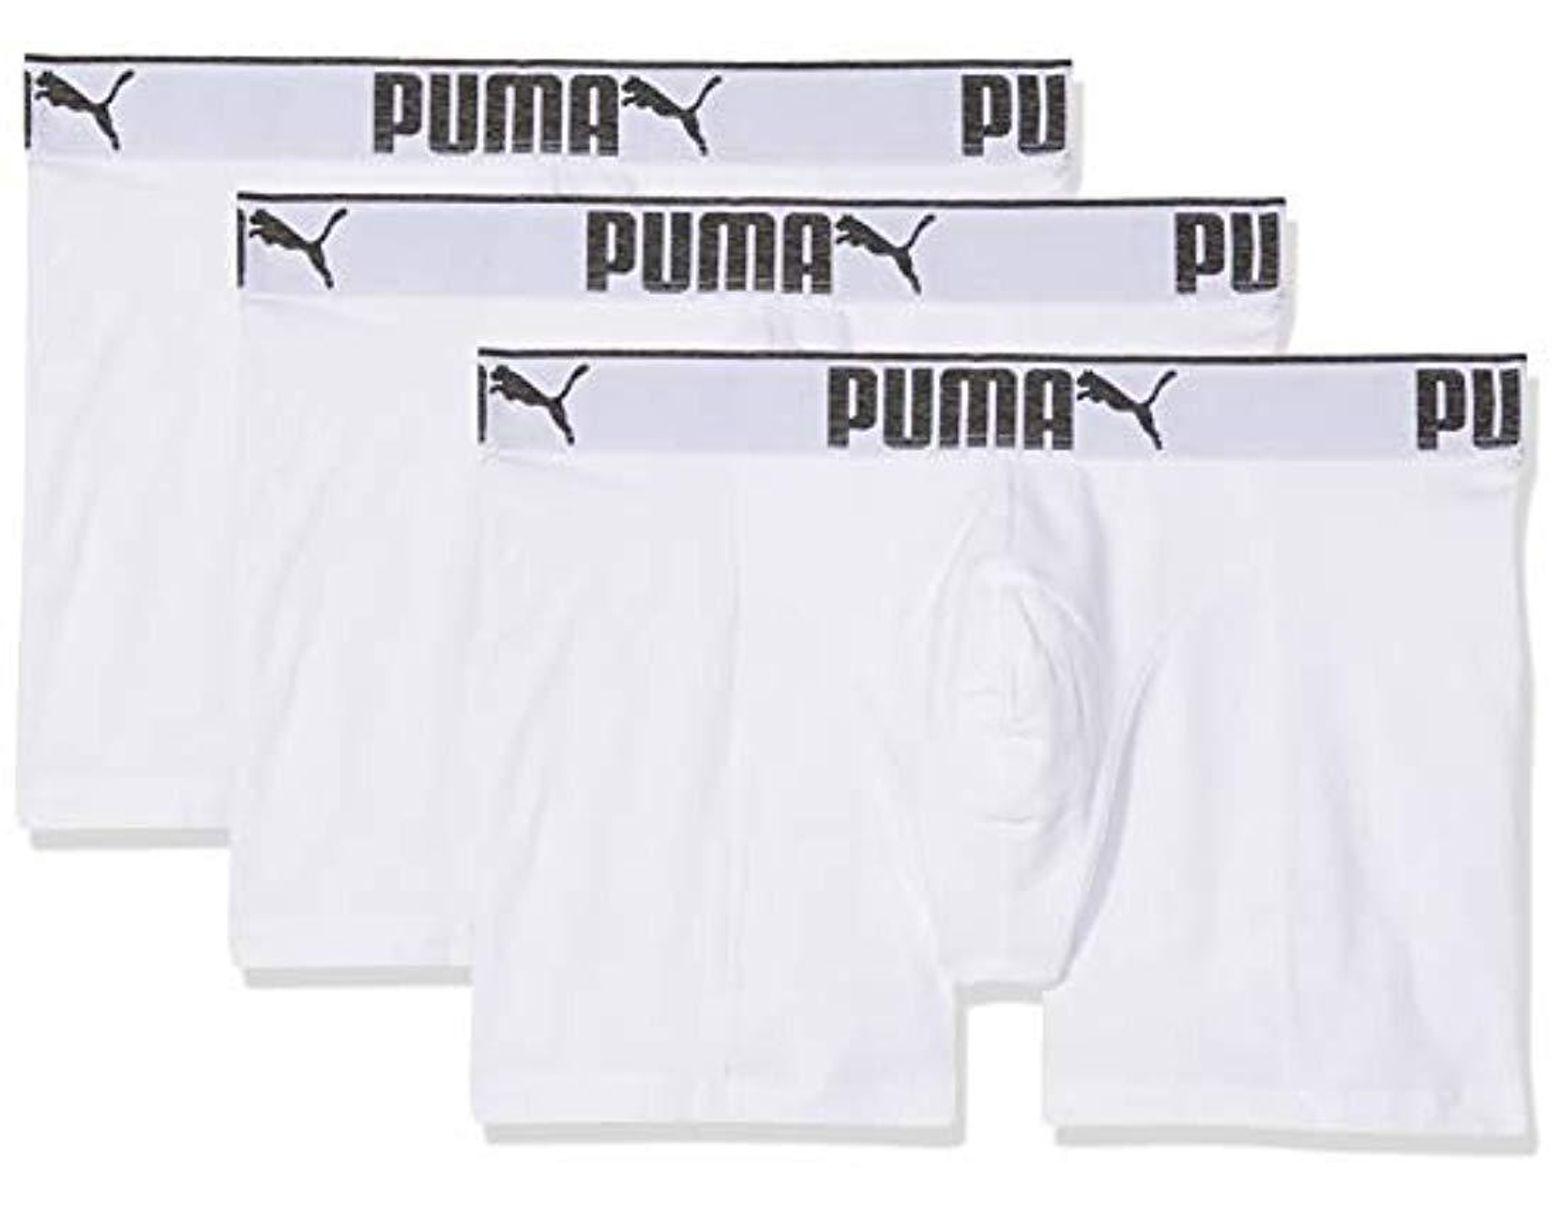 PUMA 3 X S Sueded Cotton Boxer Shorts White Medium in White